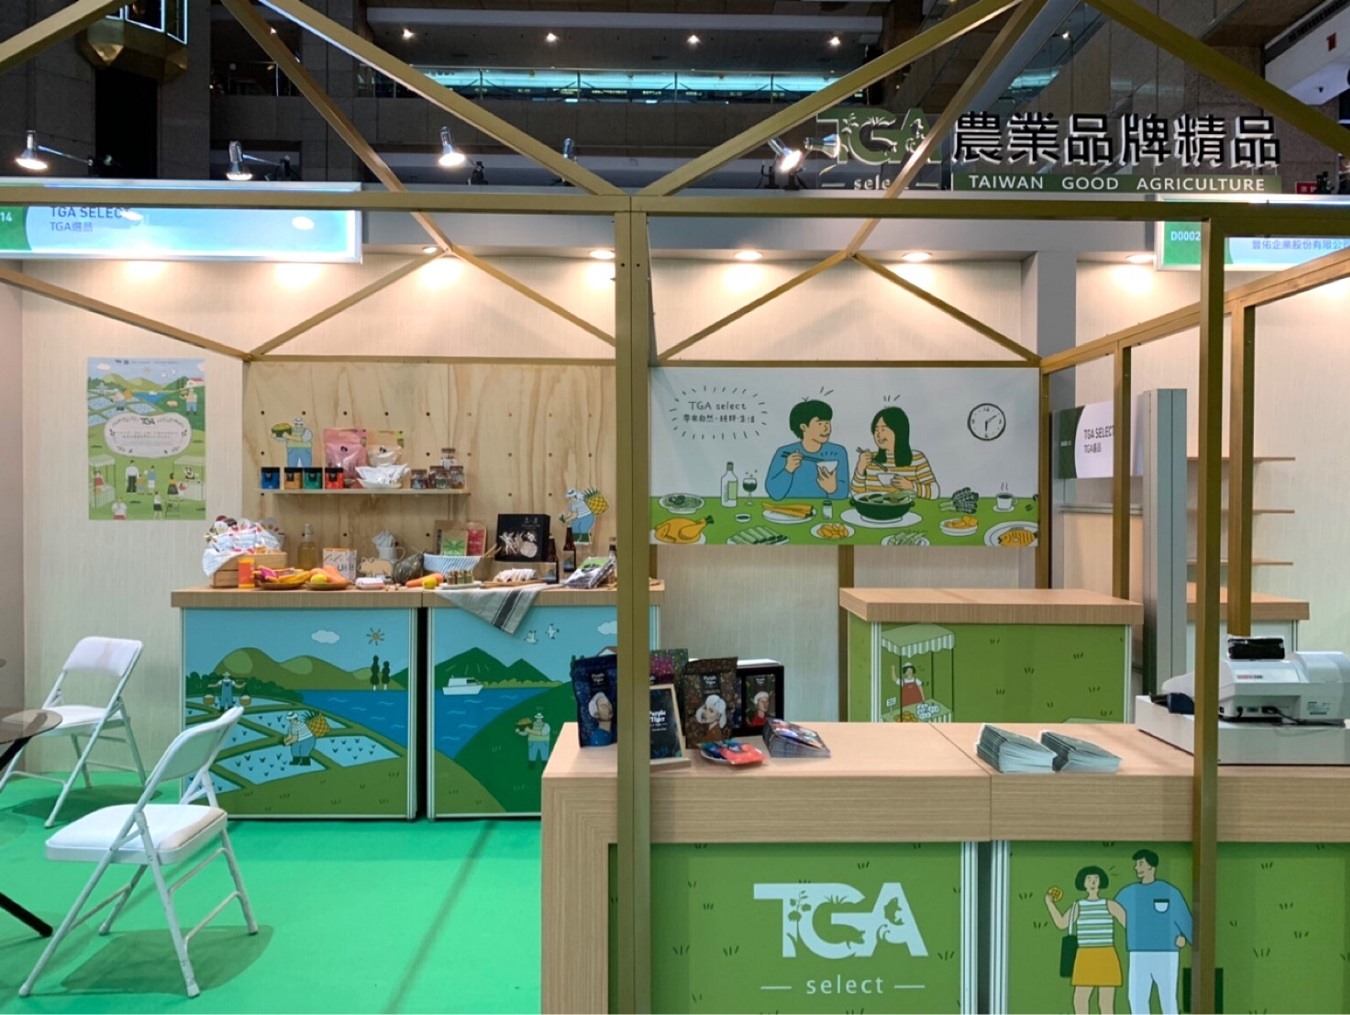 TGA農業精品強強聯手 用「便利健康」邁向國際化